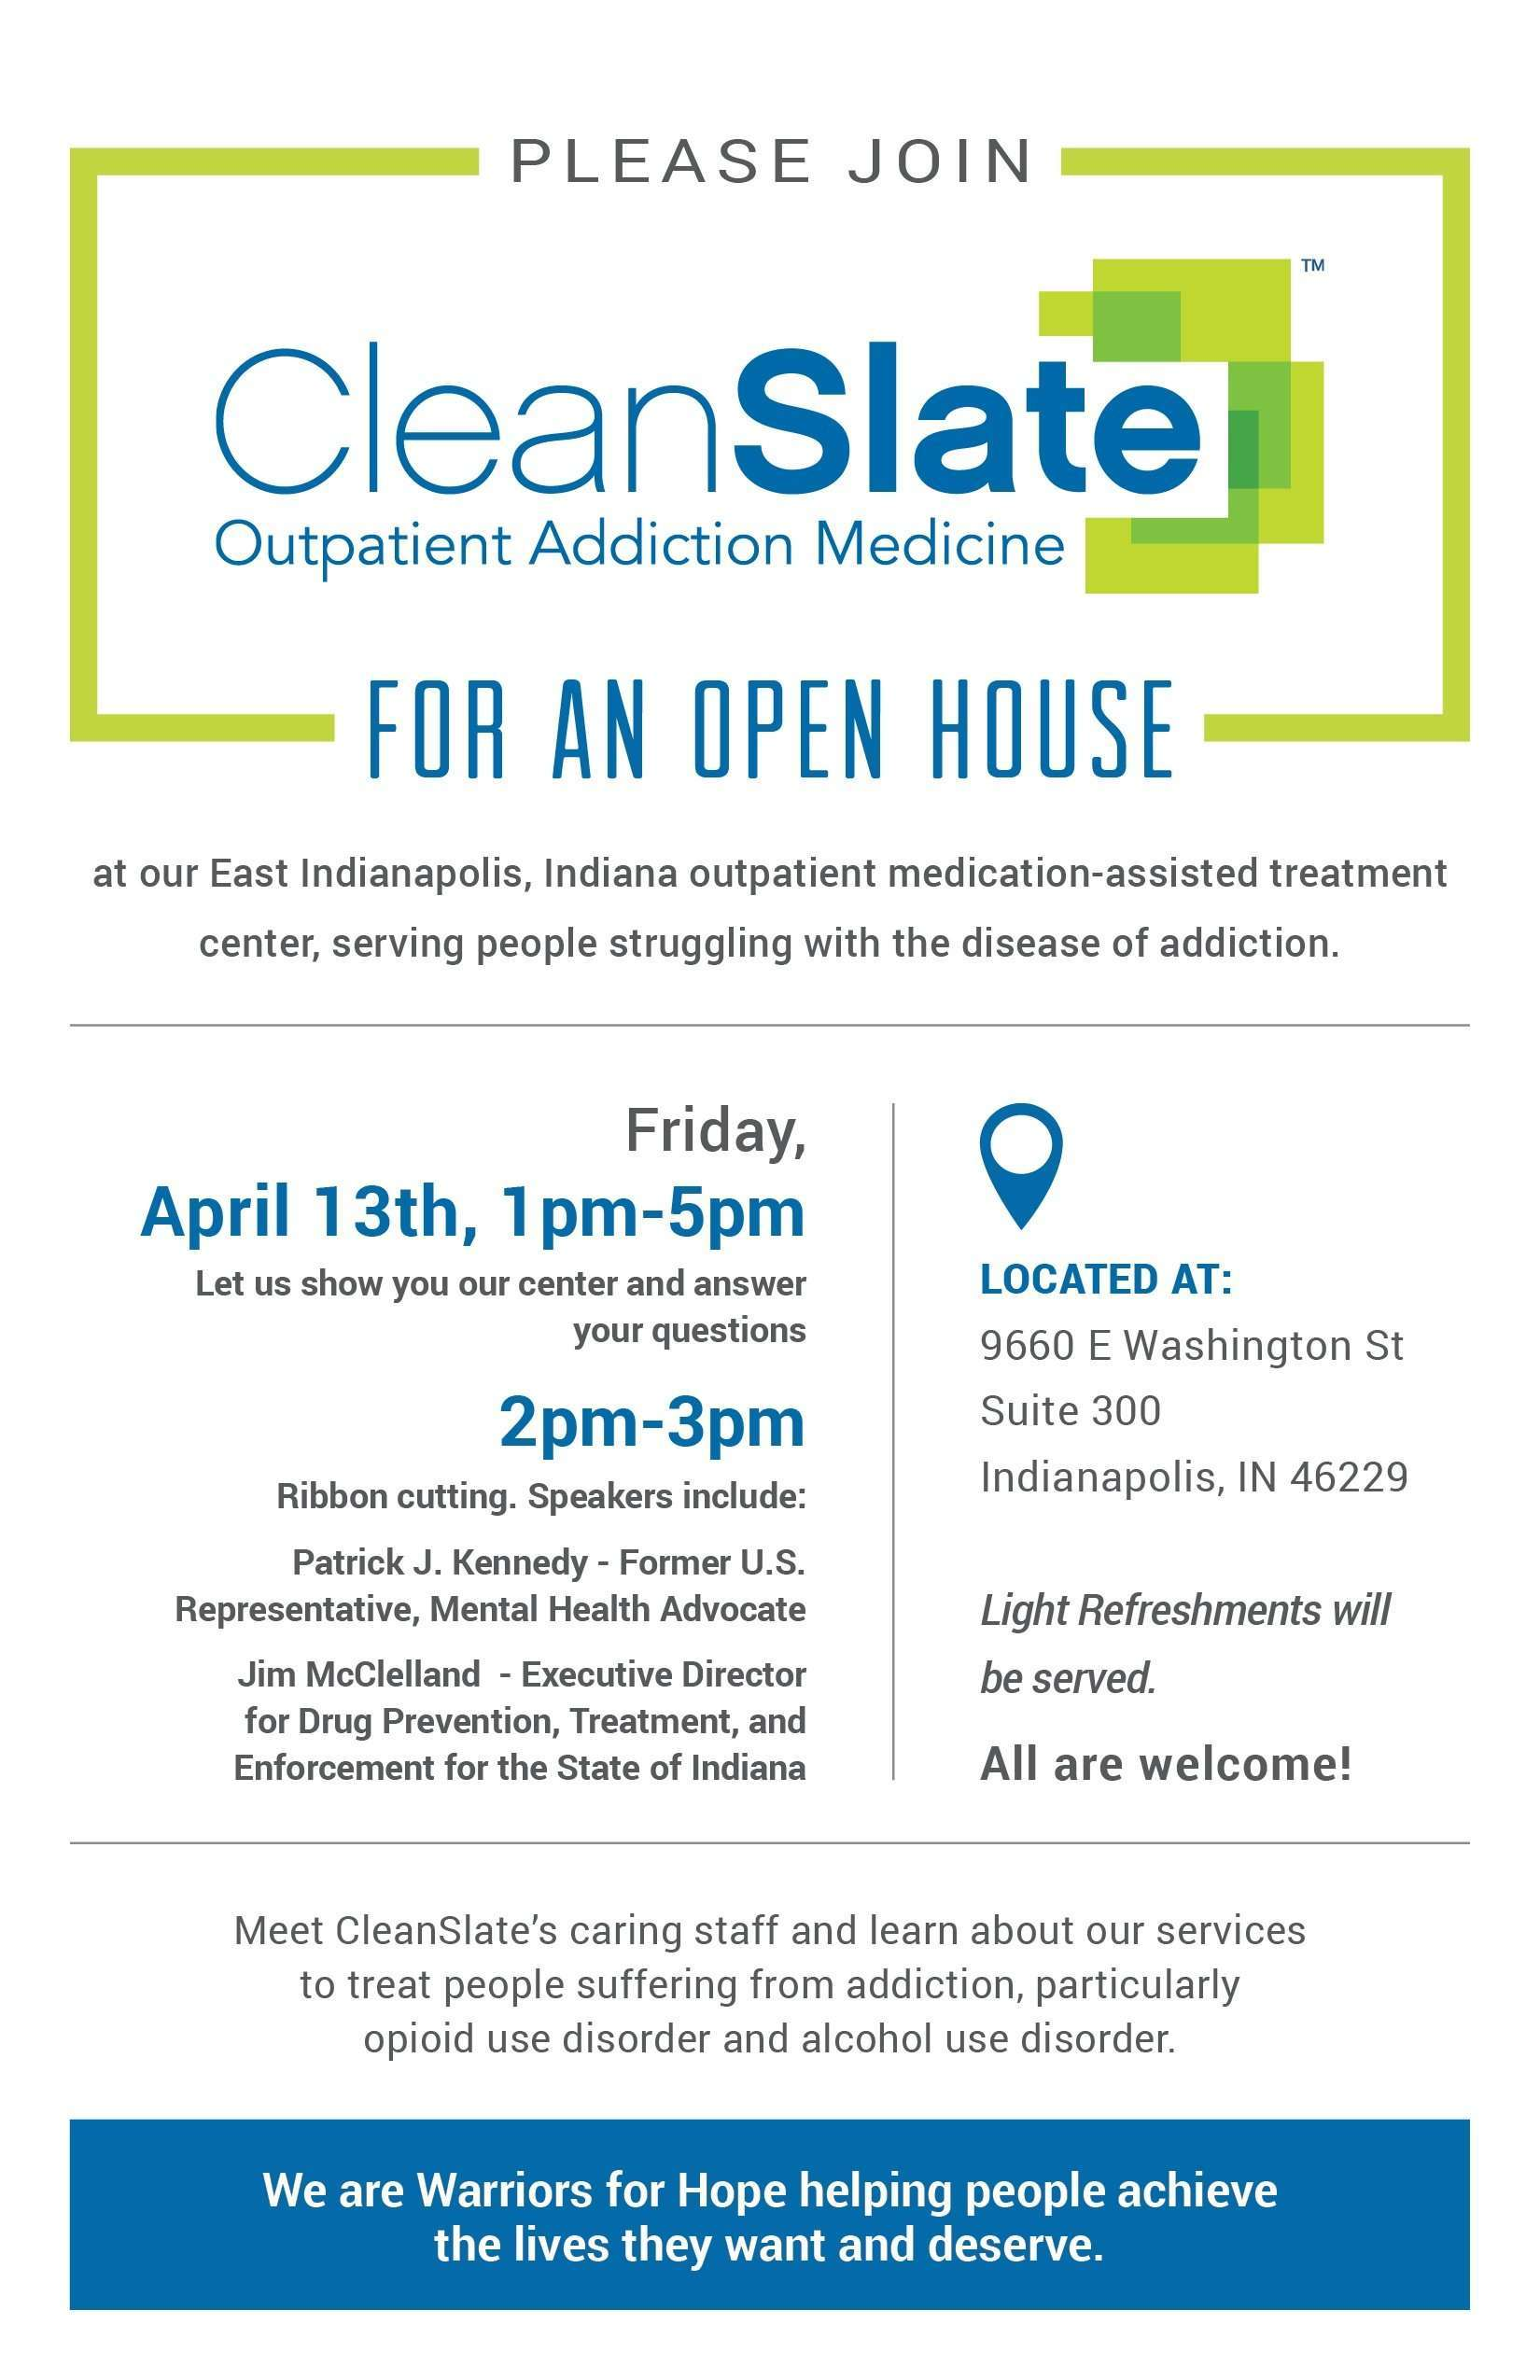 CleanSlate_OpenHouse_Invite_IndianapolisIN_East_WEB_3.26.18-1